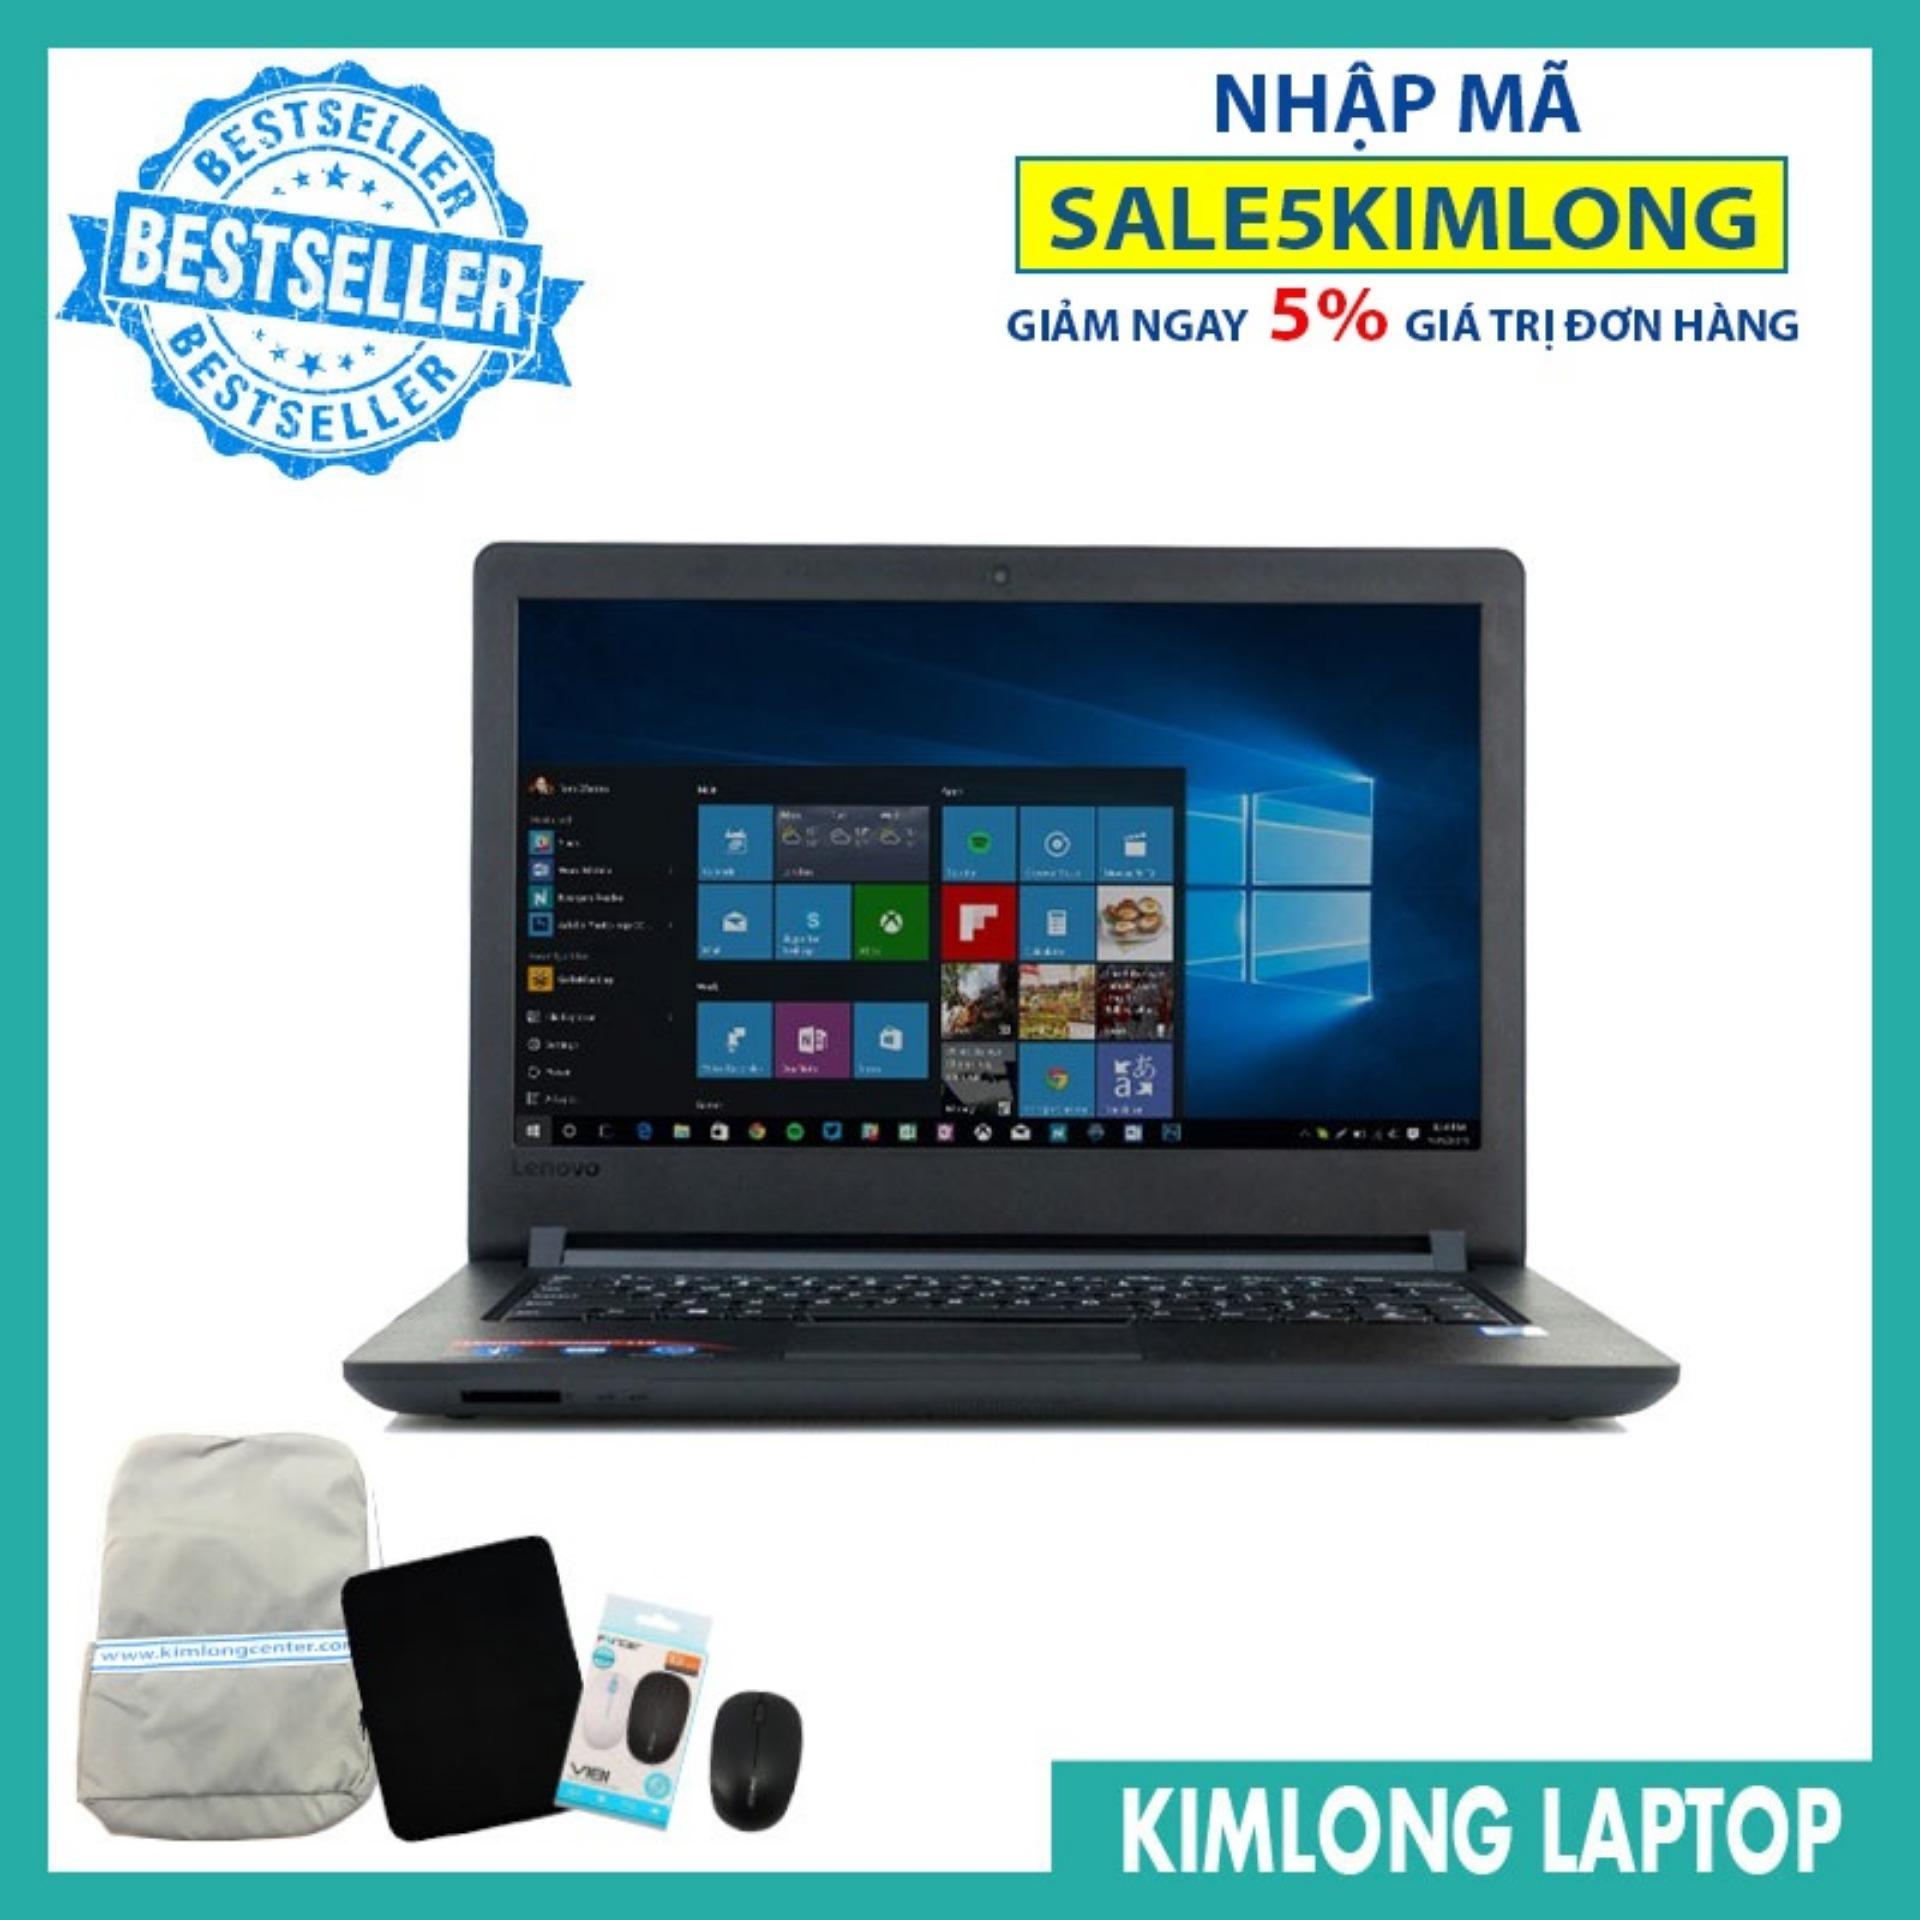 Hình ảnh Laptop Lenovo IdeaPad 110 14ISK : i3 6006U 4GB RAM 1TB HDD Intel® HD Graphics DVD±R/RW 14